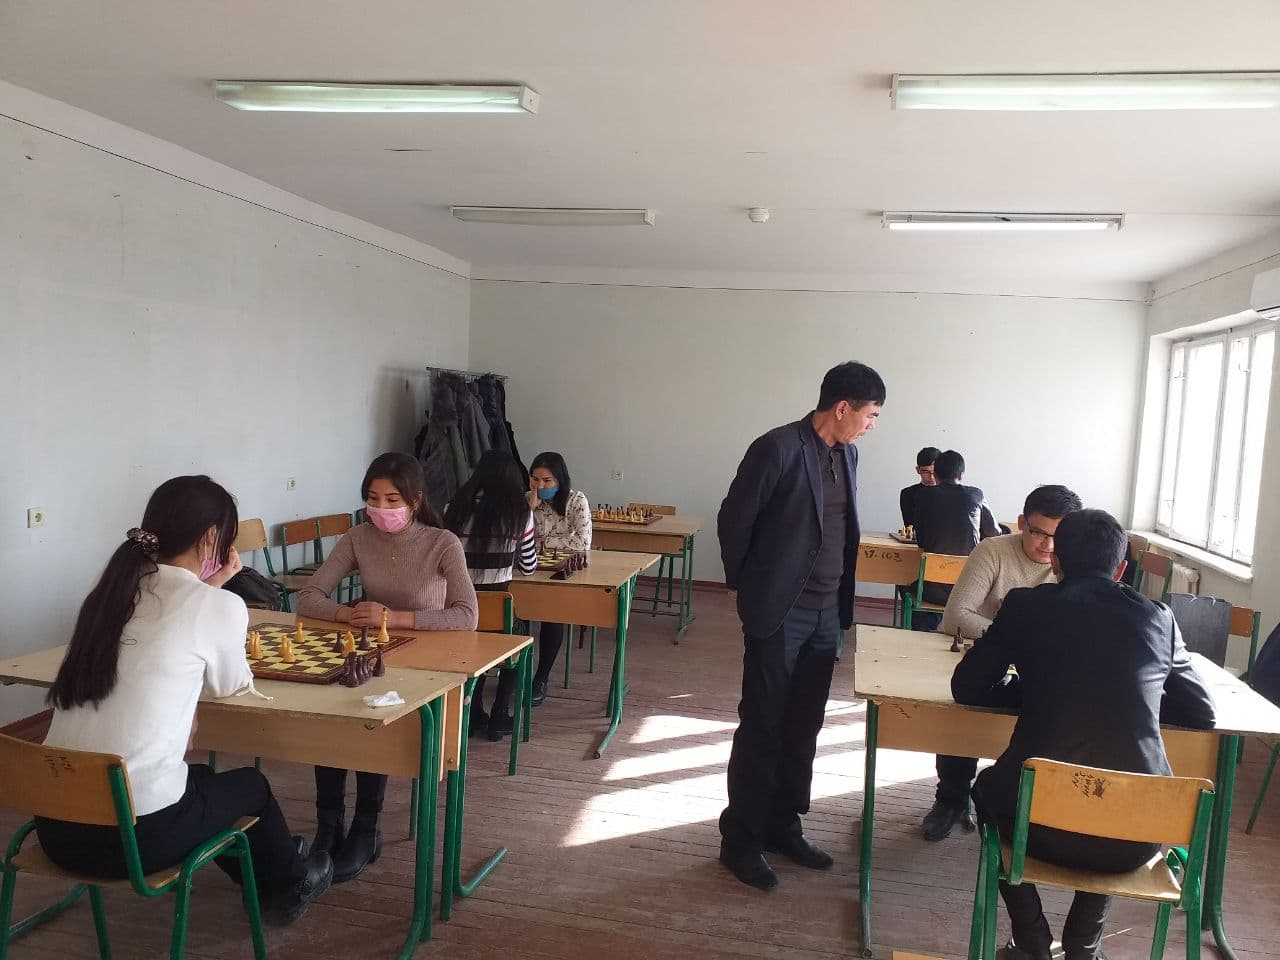 2 2 - Шахмат-шашка бойынша студентлер арасында өткерилген жарыс жеңимпазлары анықланды